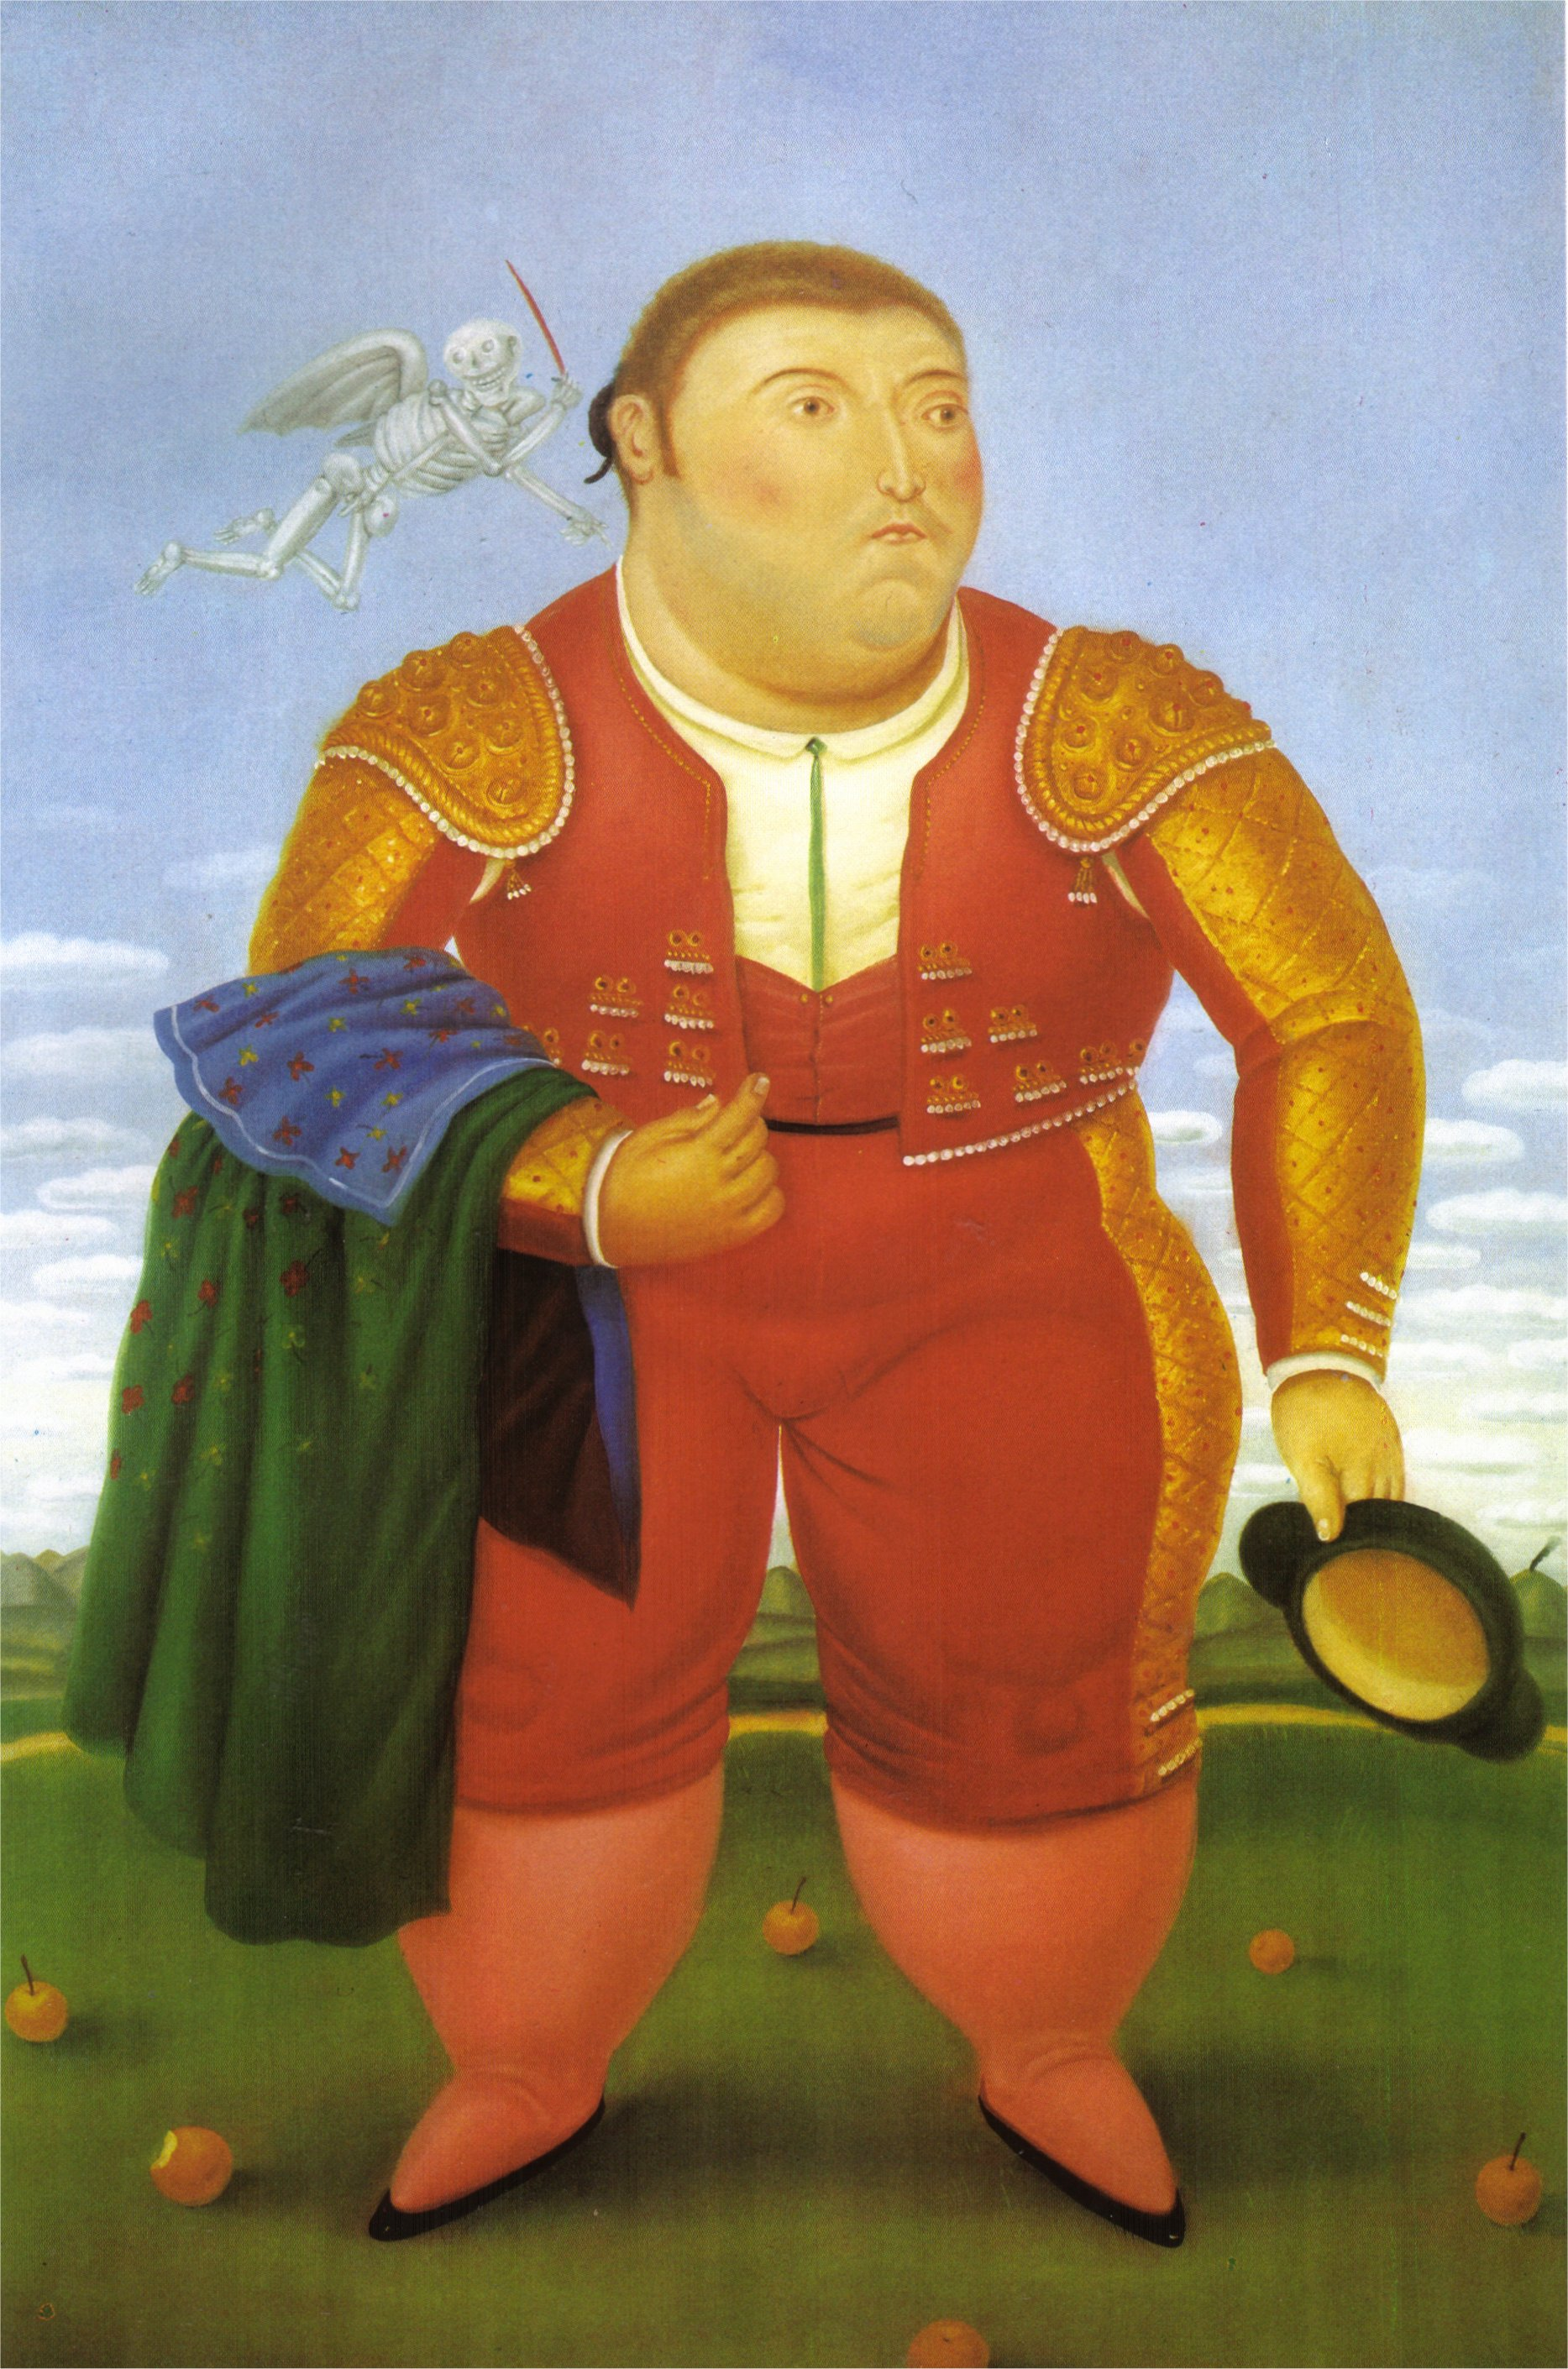 El Arte De Fernando Botero Lessons Tes Teach